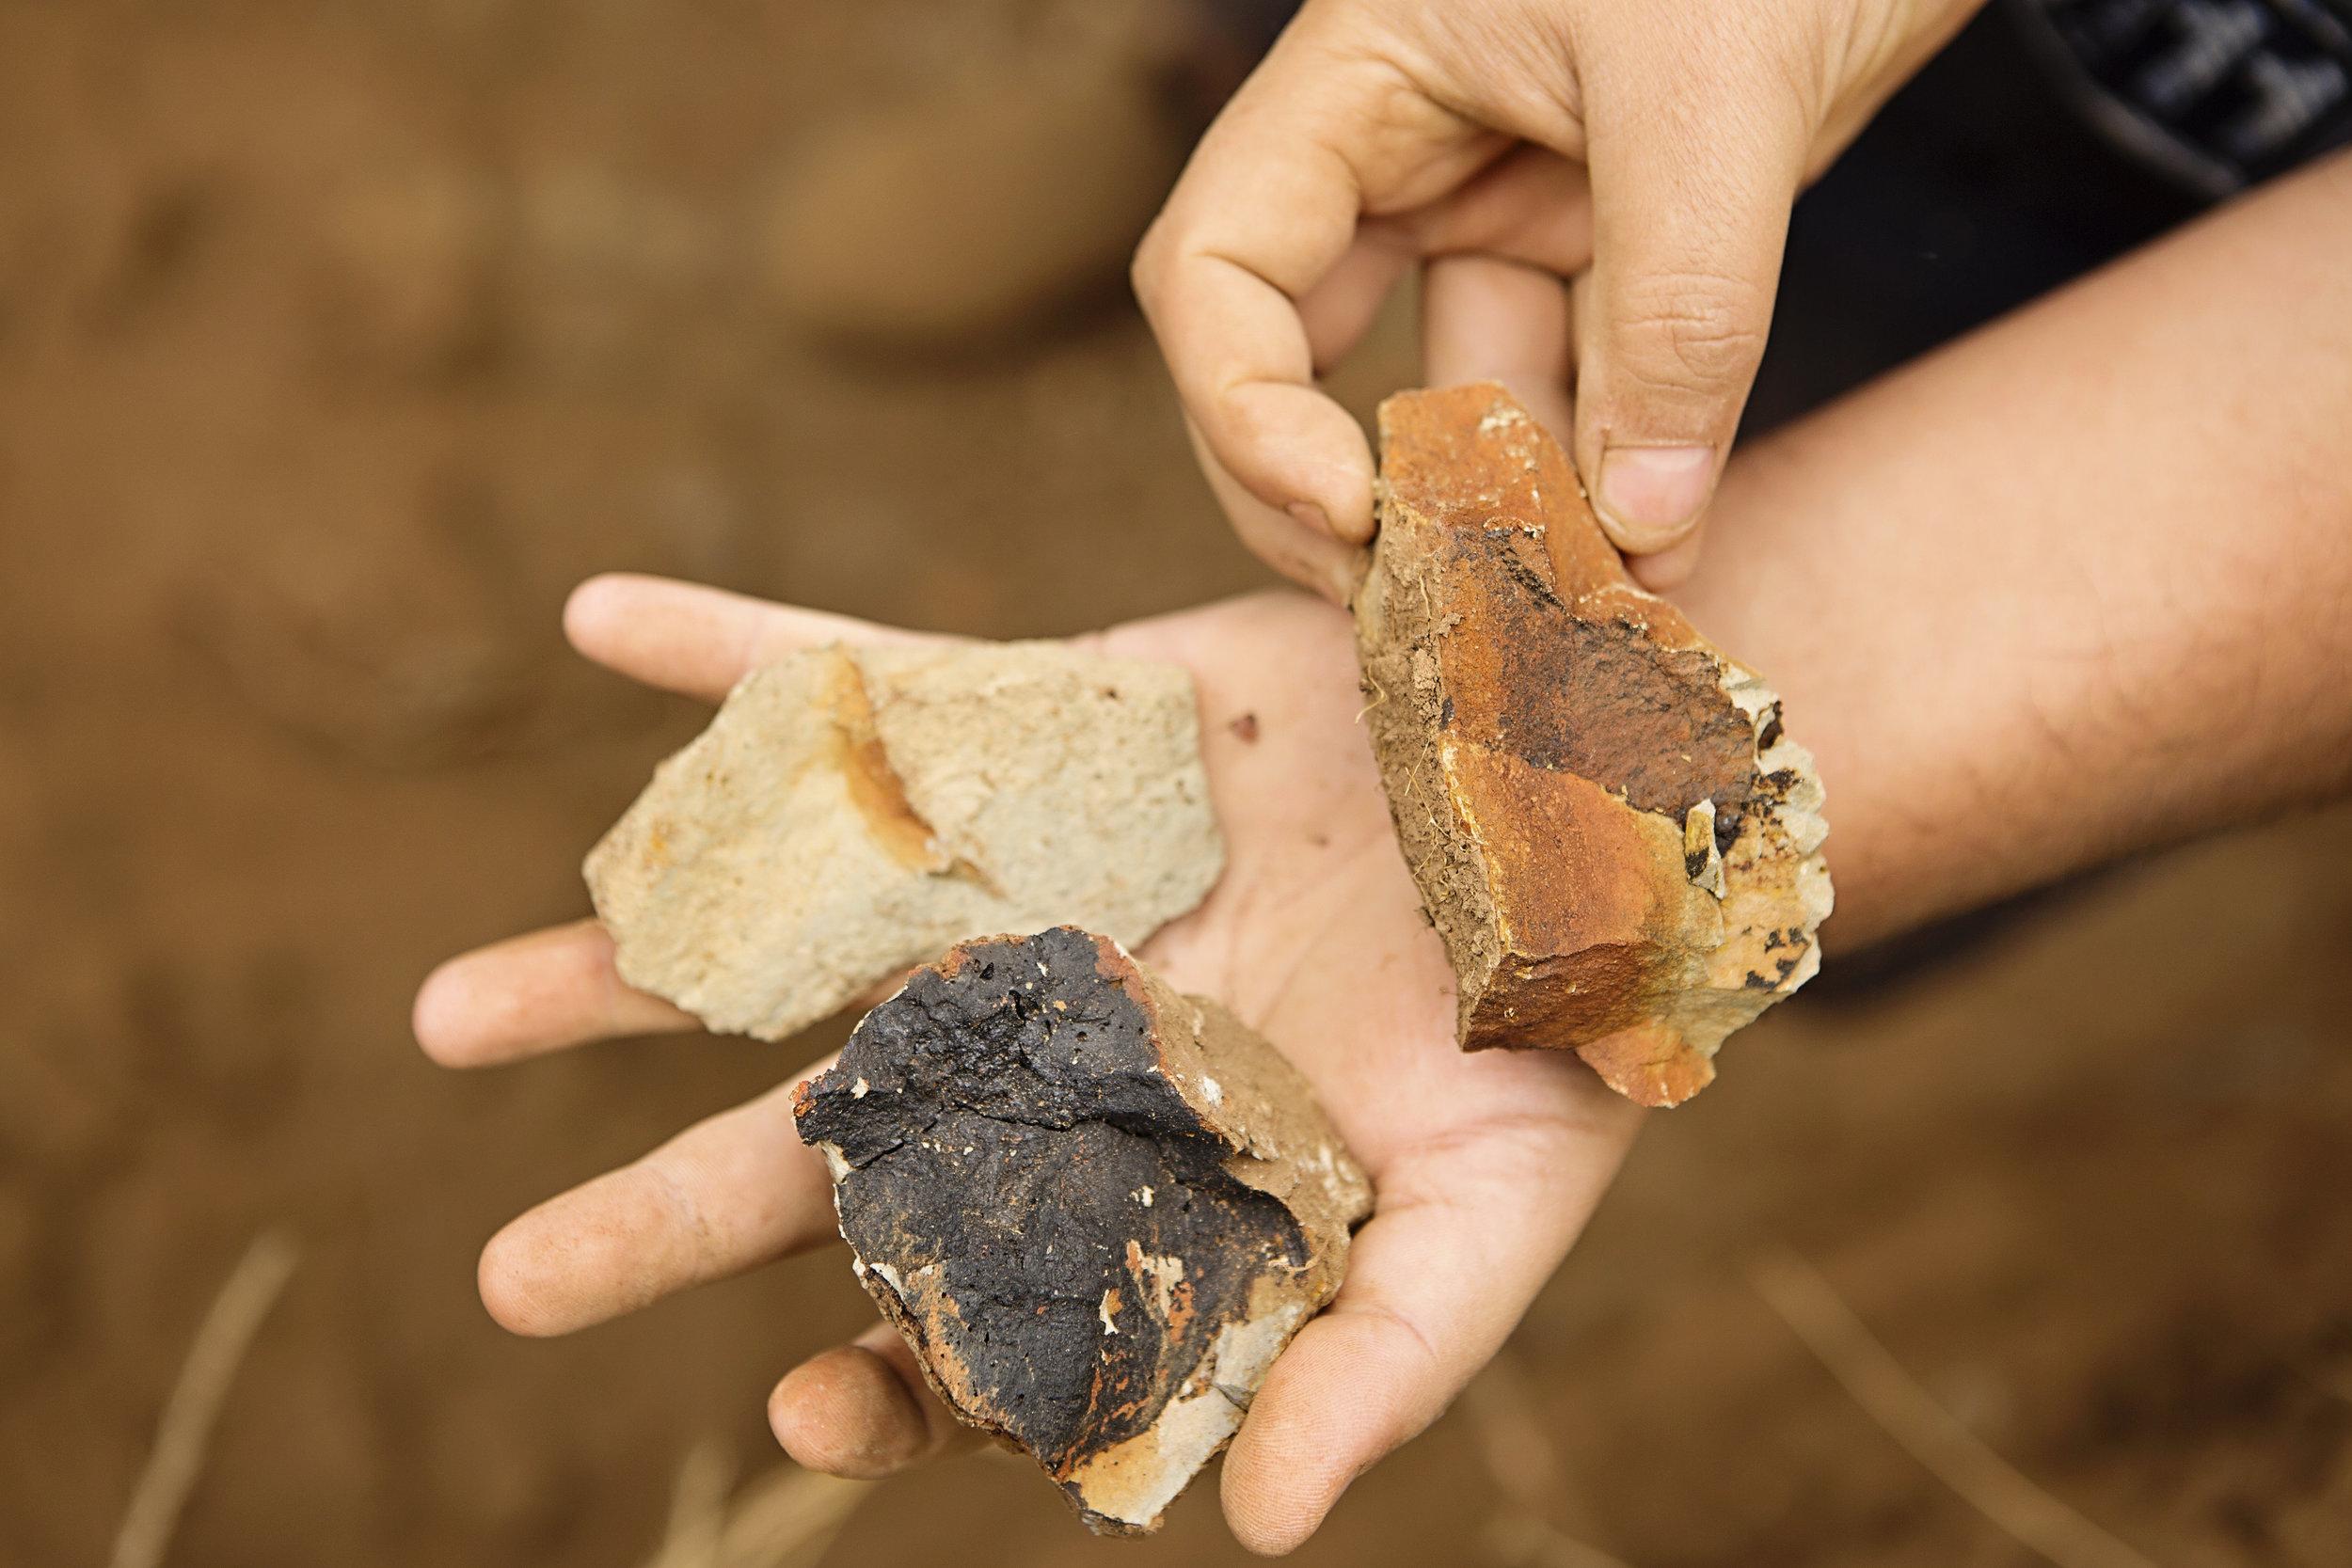 Three kinds of volcanic soil (black, oxidized basalt, ash)